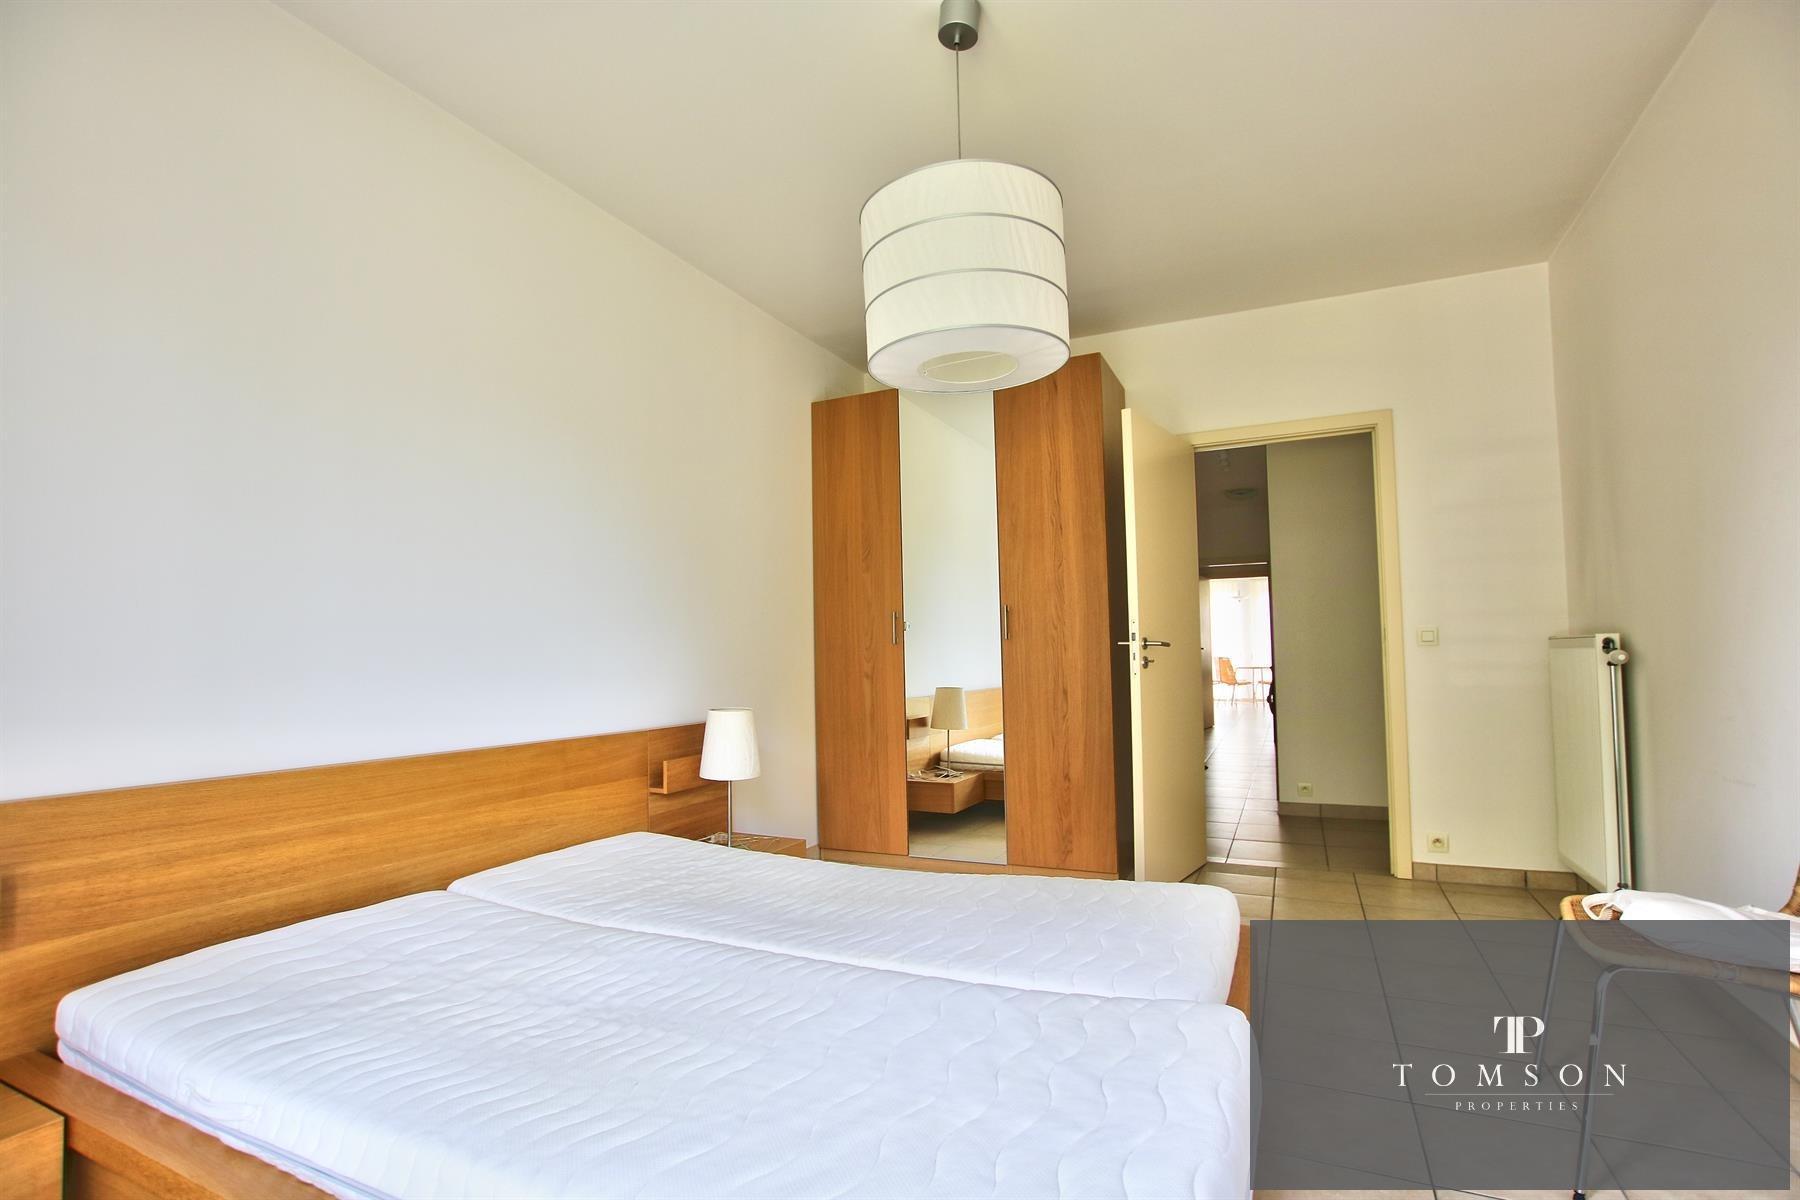 Appartement - Woluwe-Saint-Lambert - #4444905-8